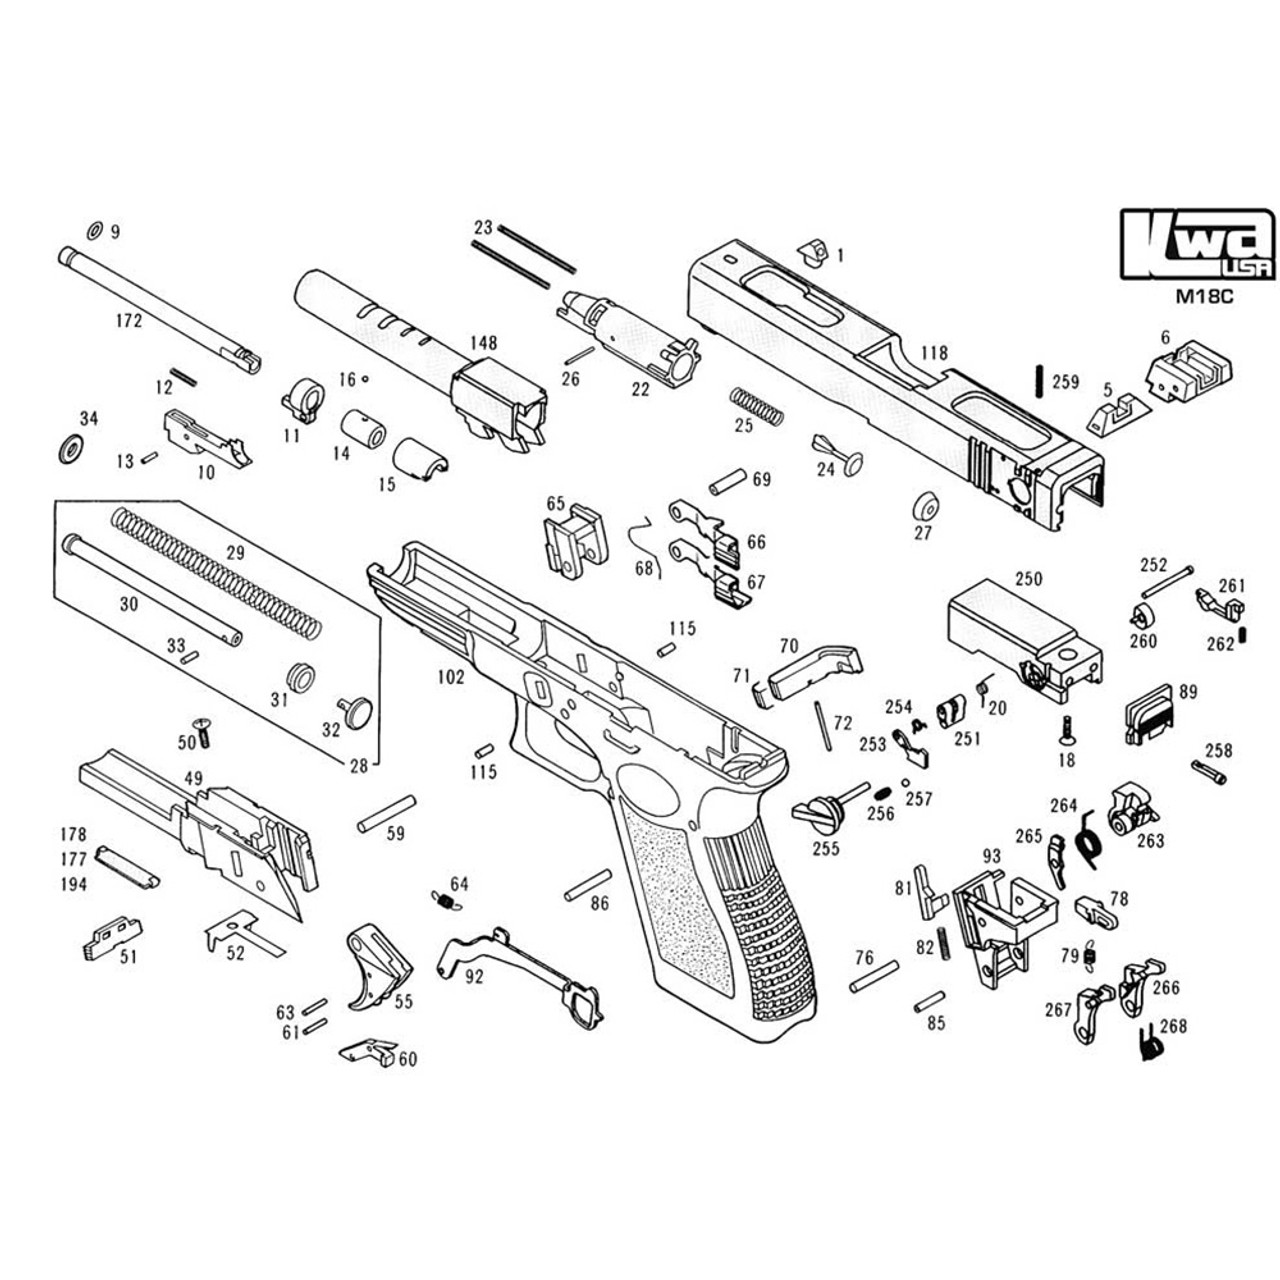 kwa airsoft m18c pistol diagram [ 1000 x 1000 Pixel ]